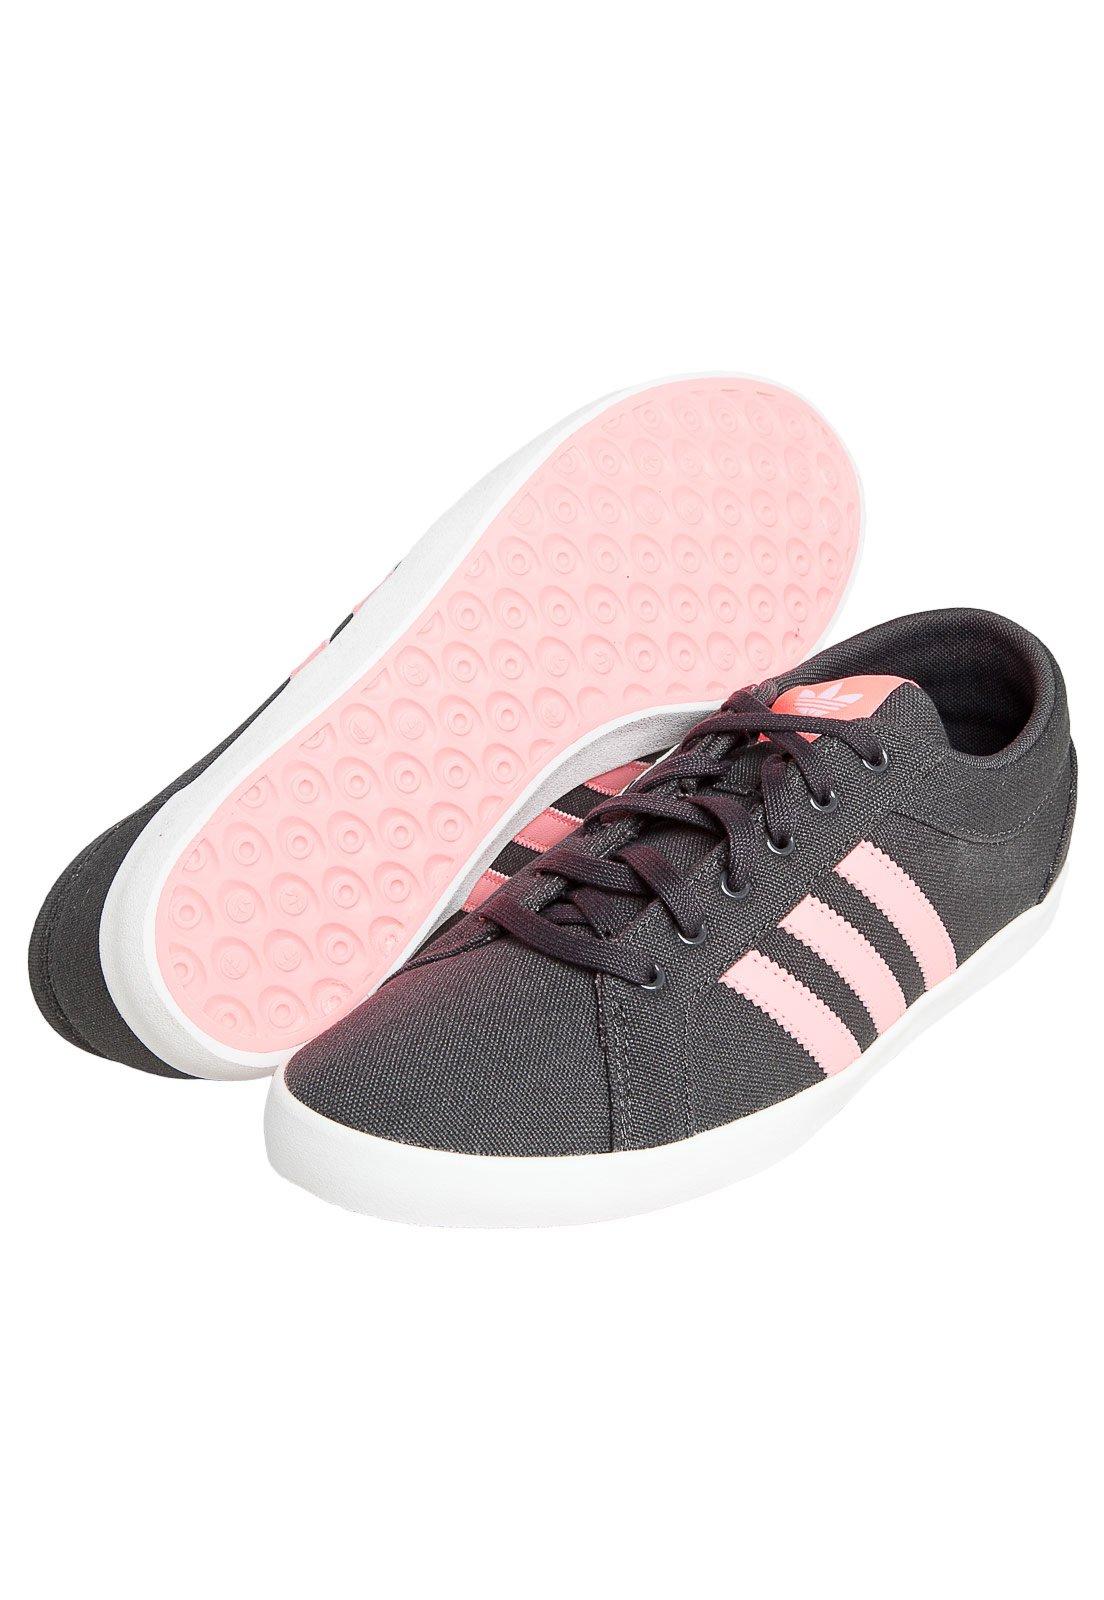 adidas feminino cinza com rosa